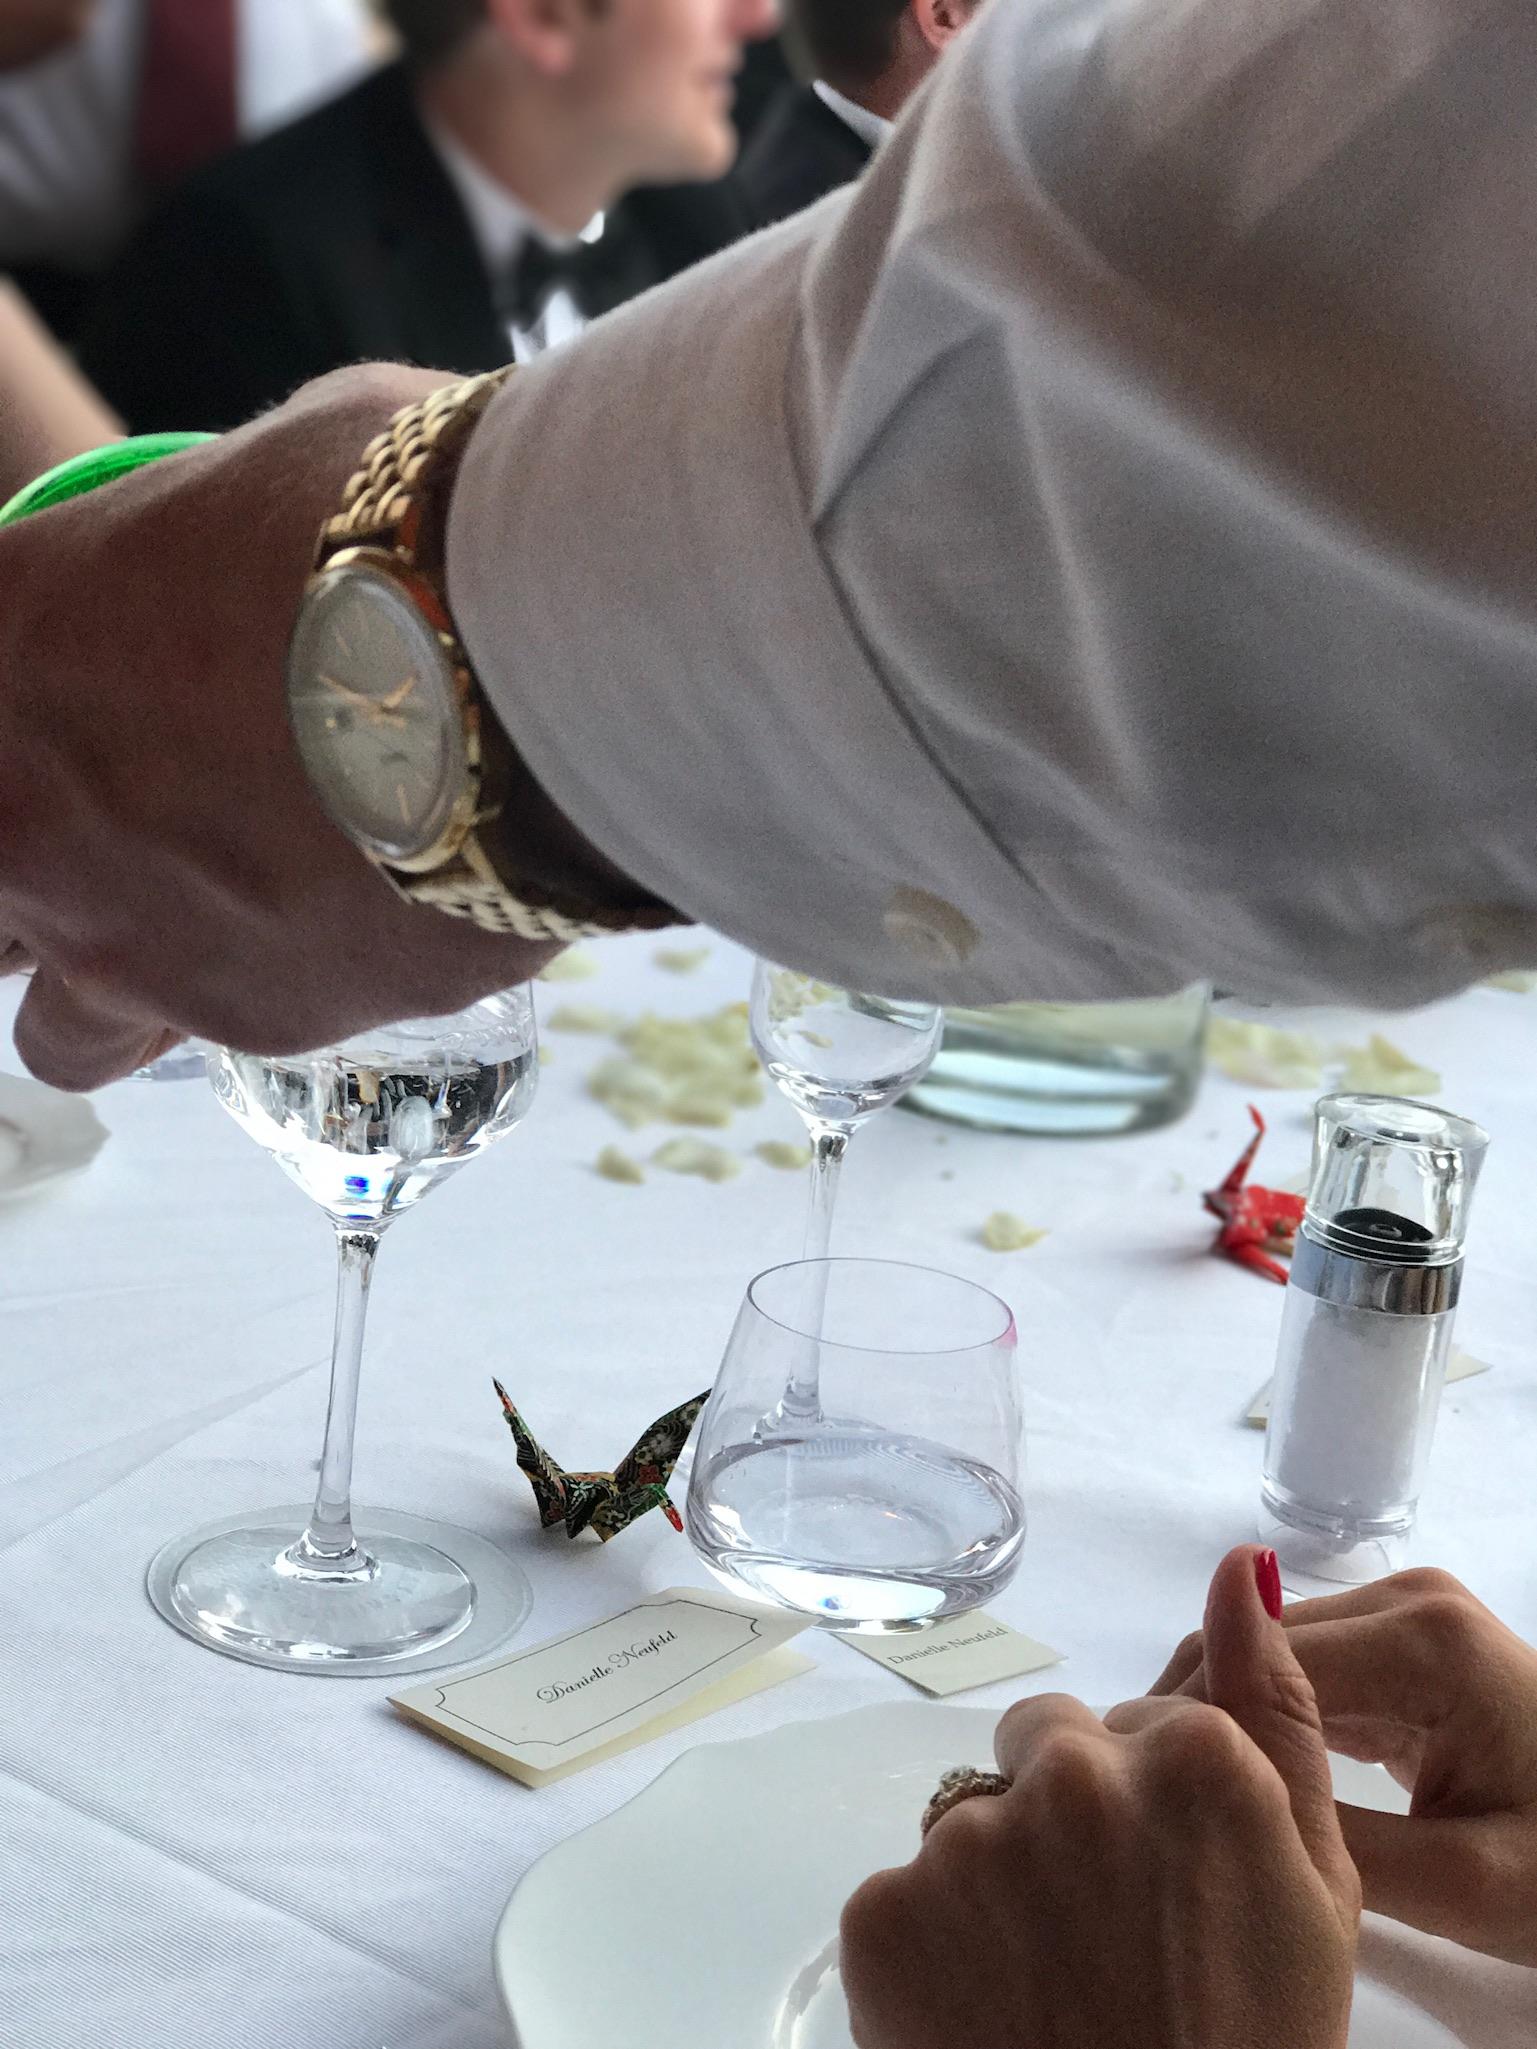 https://www.weddingamalfi.com/wp-content/uploads/Nathalie-and-Benjamin-Wedding-in-Positano-Italy-28.jpg